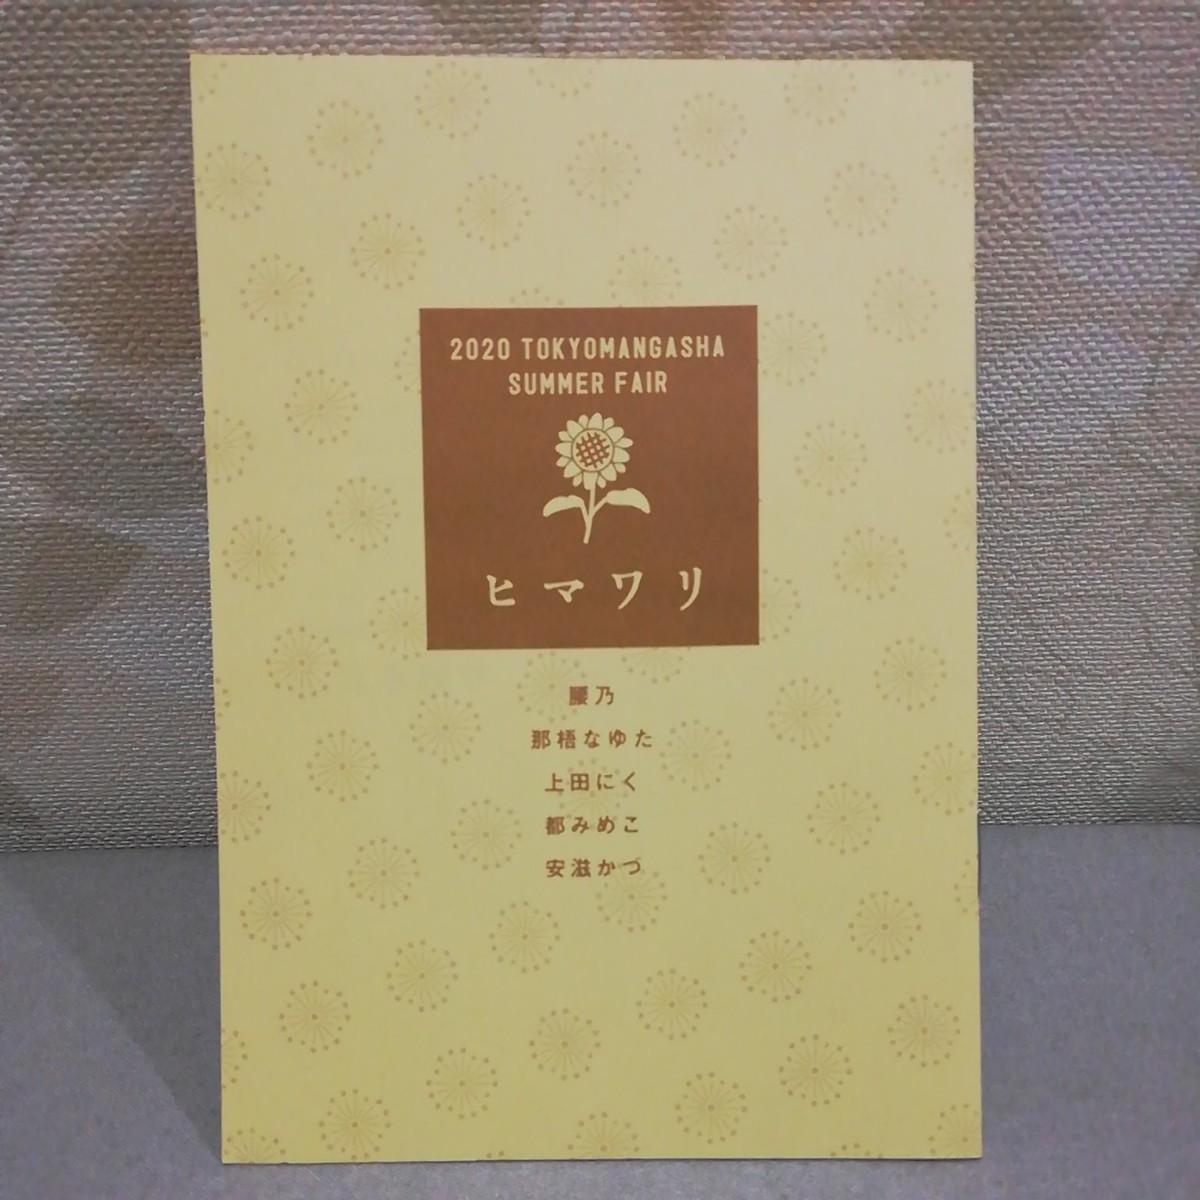 BLコミック特典☆小冊子ヒマワリ★2020 東京漫画社 SUMMER FAIR ☆サマーフェア